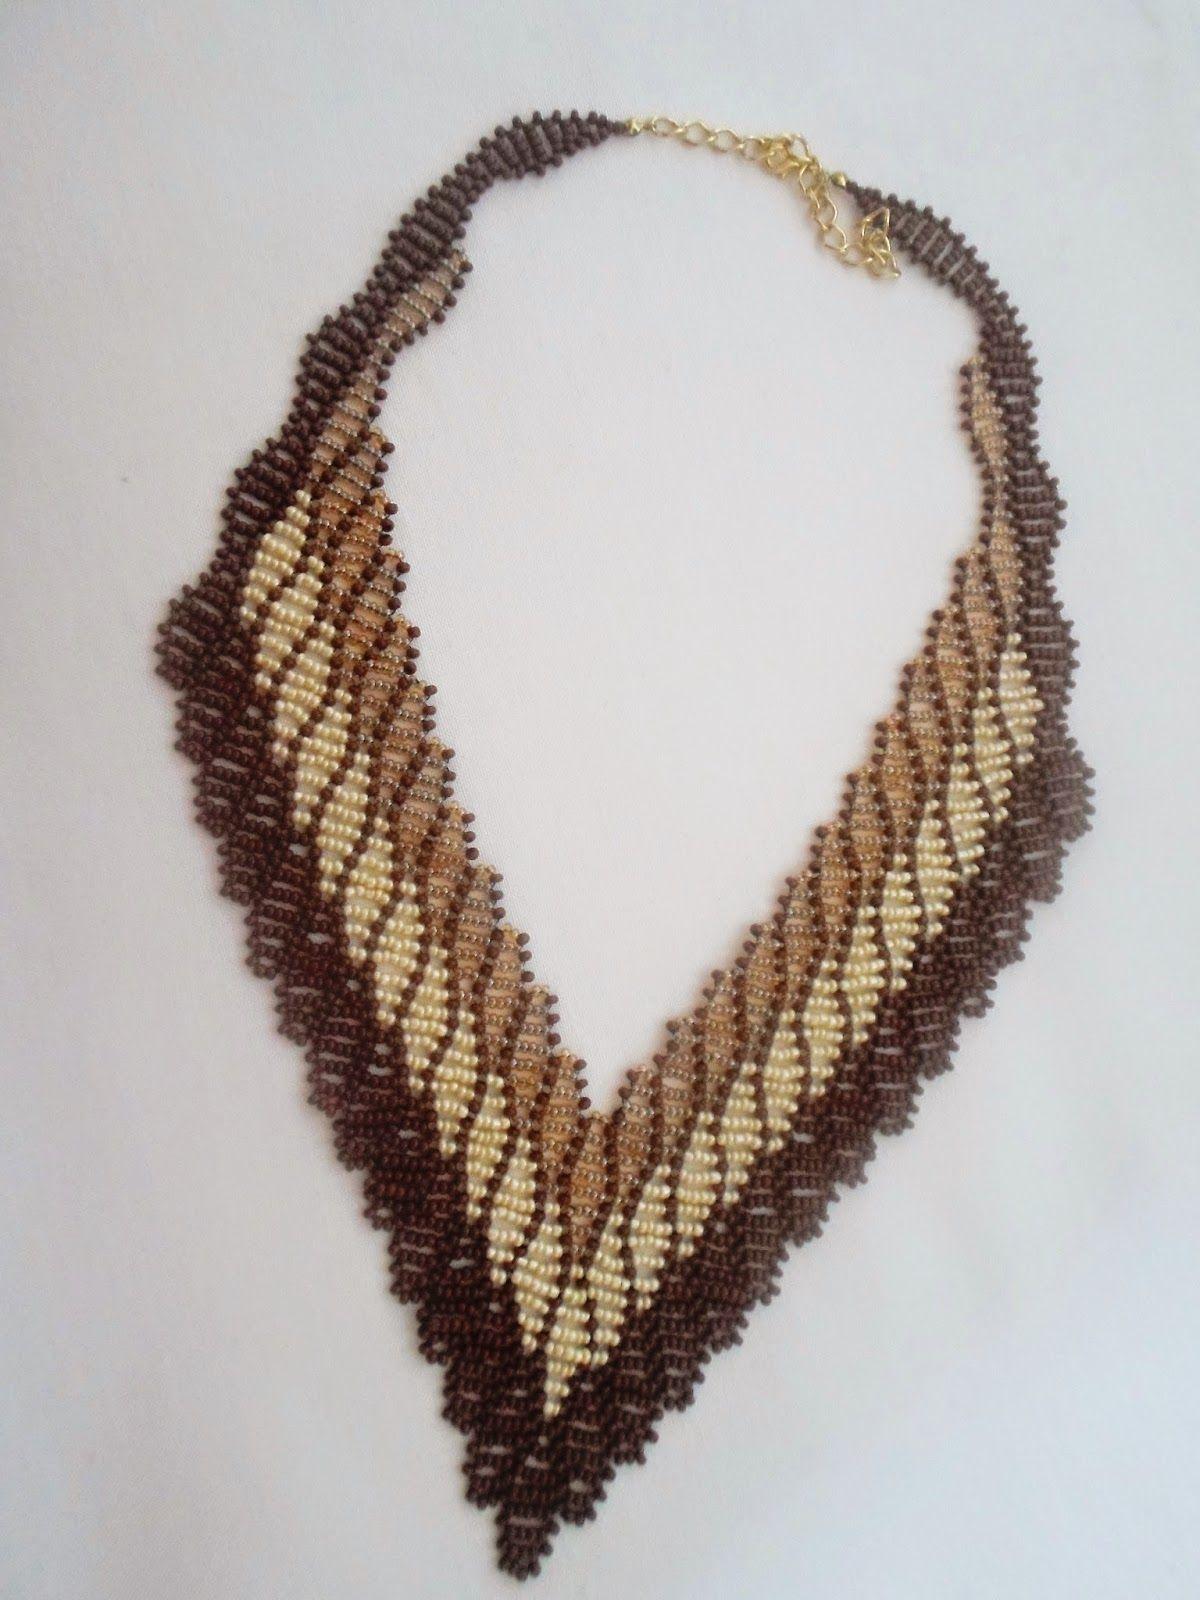 Passo a Passo Maxi colar de miçangas | NM Bijoux Núbia Maia